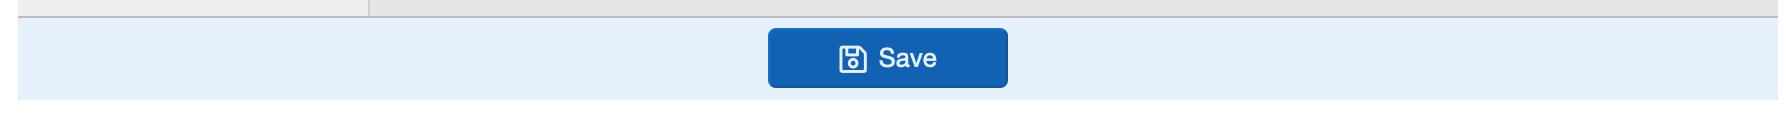 Tutorial - Save.png